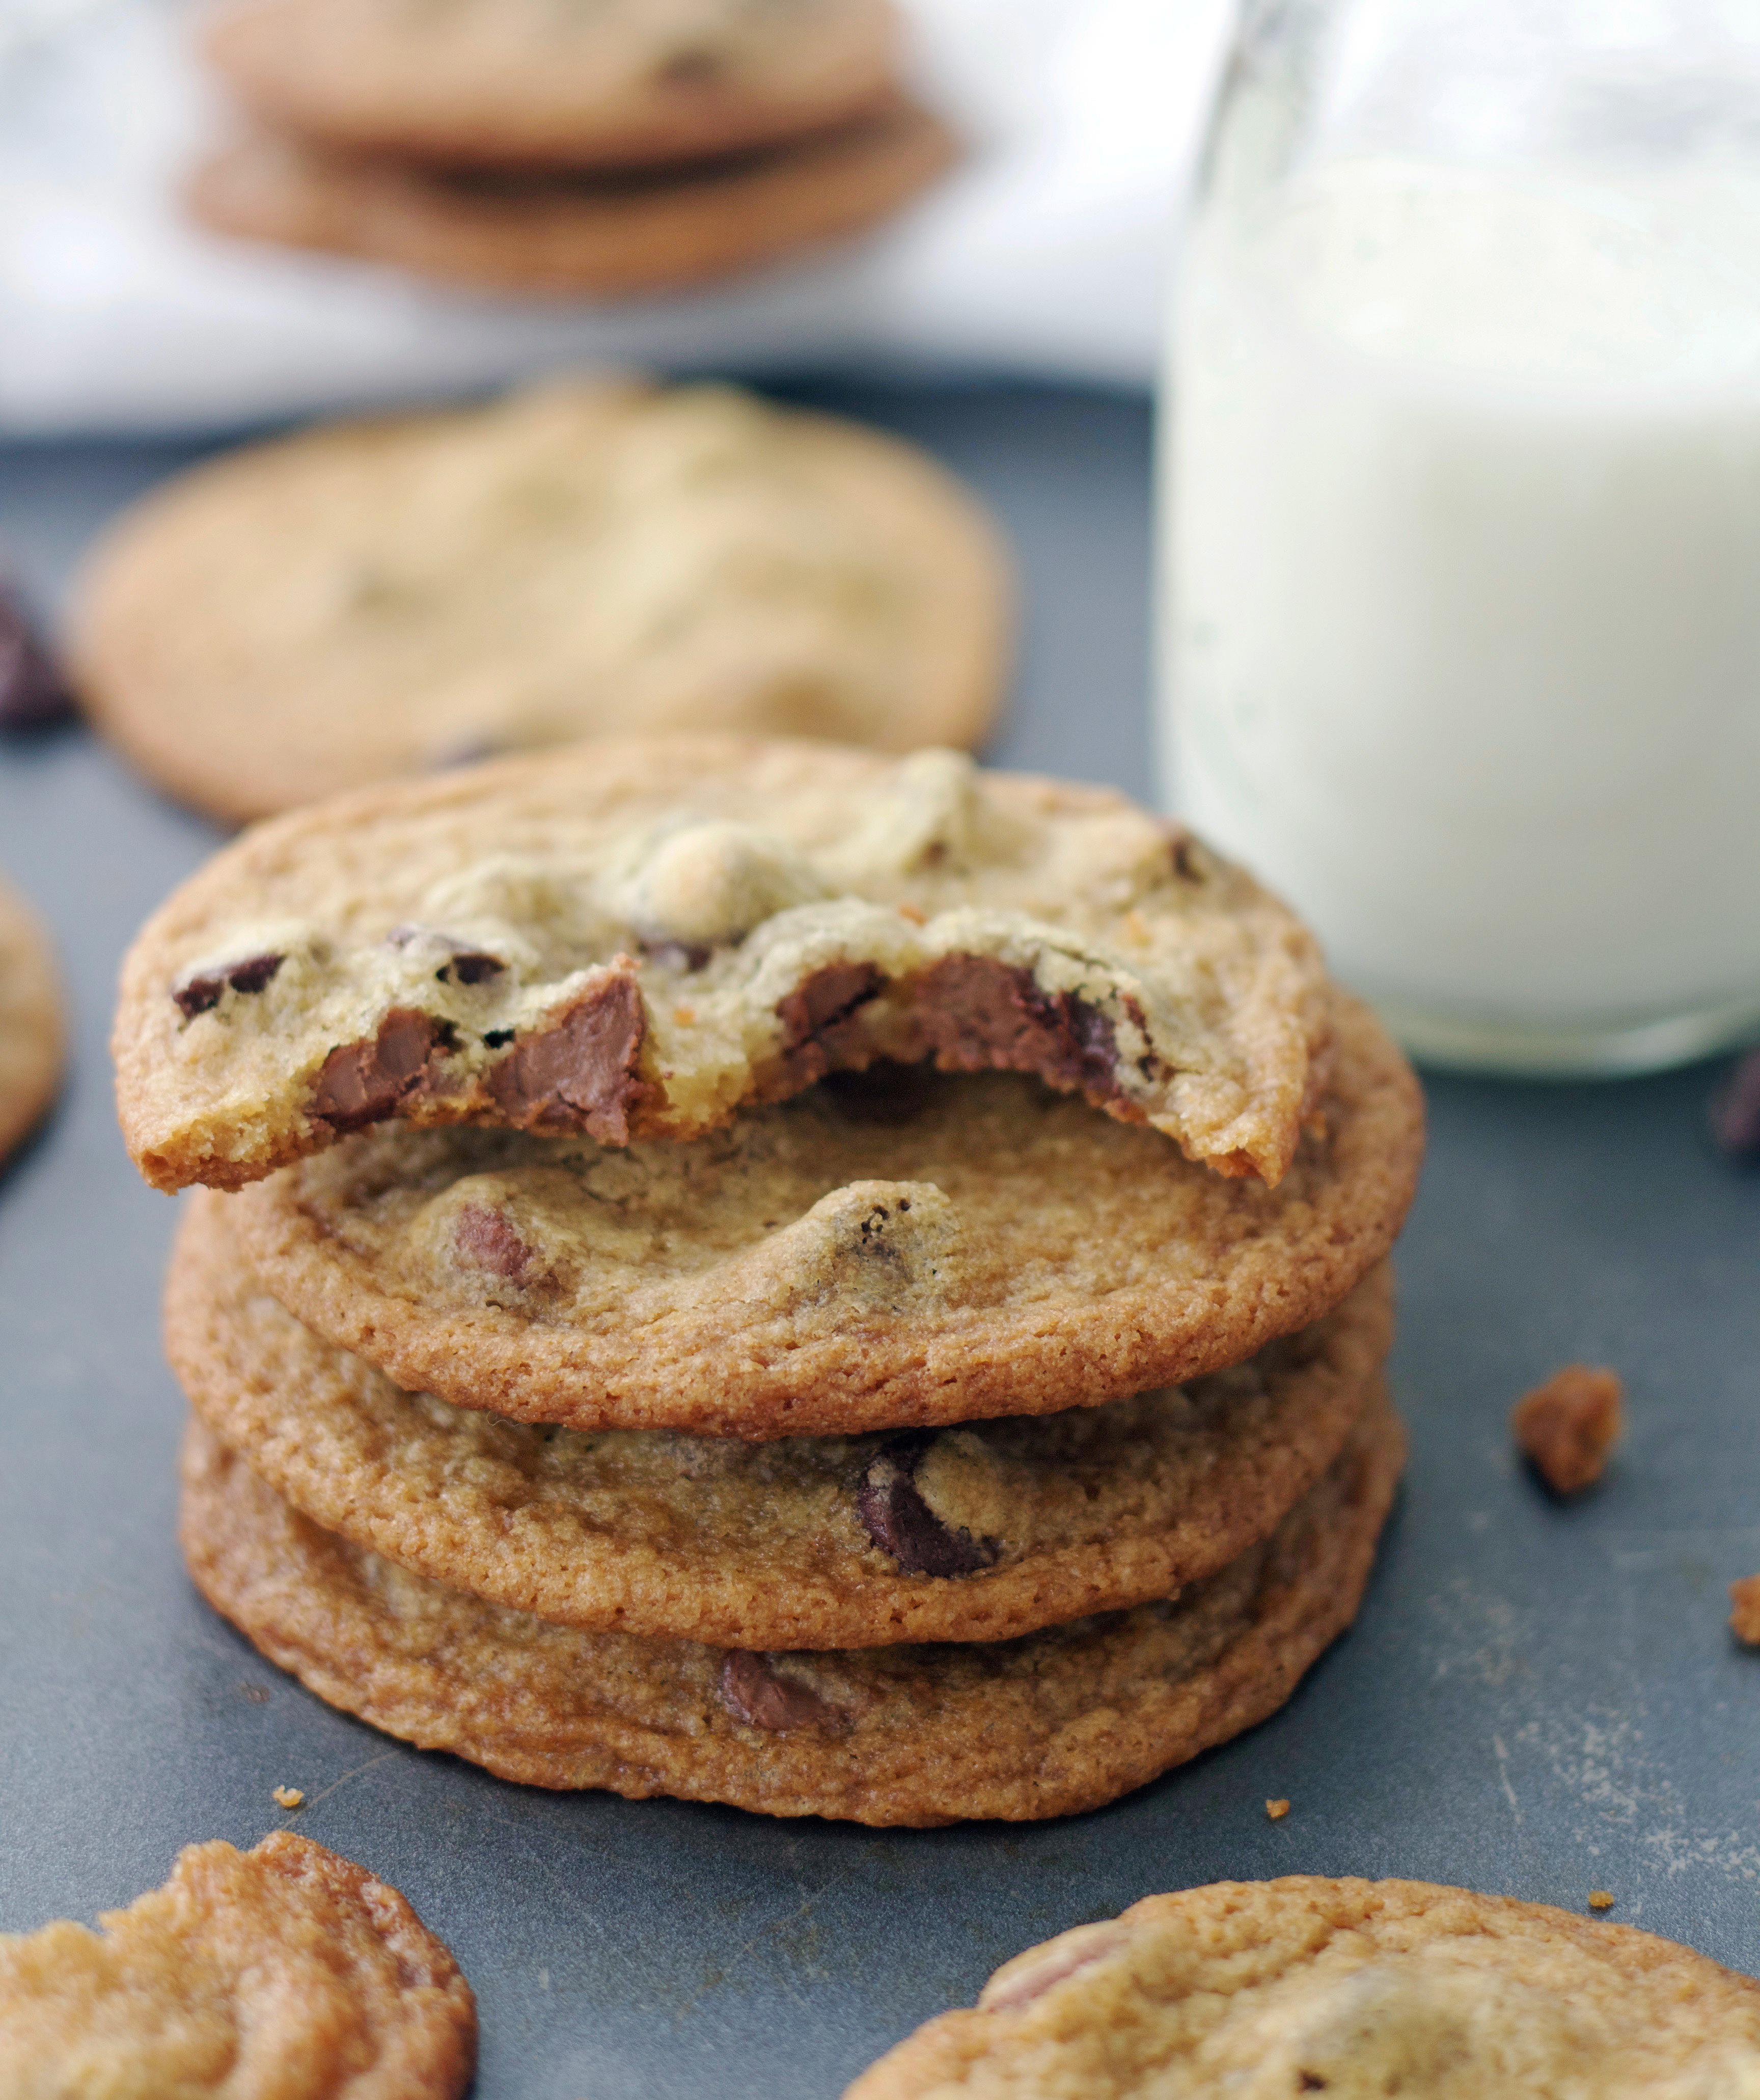 Crispy Chocolate Chip Cookies  Thin & Crispy Chocolate Chip Cookies 5 Boys Baker